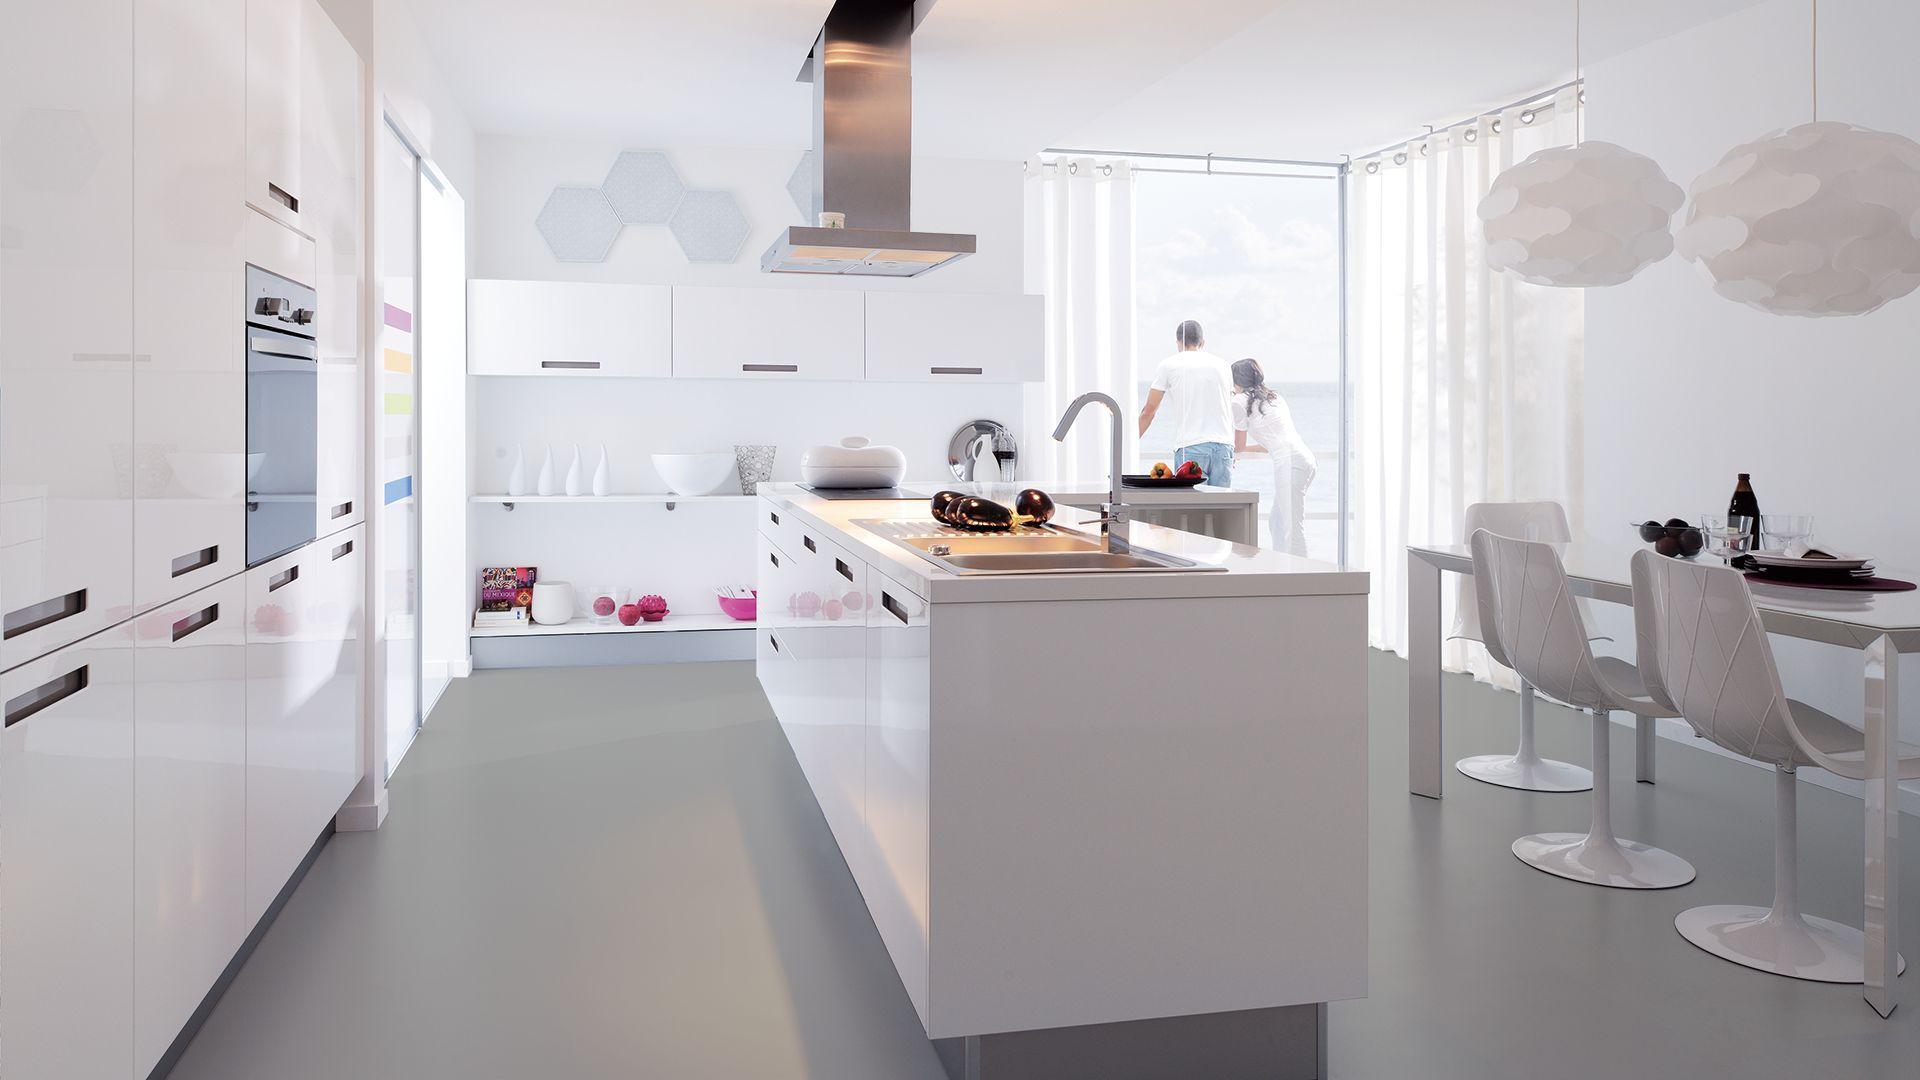 Modele de cuisine cuisinella gallery of ilot cuisine en for Cuisinella paris 11